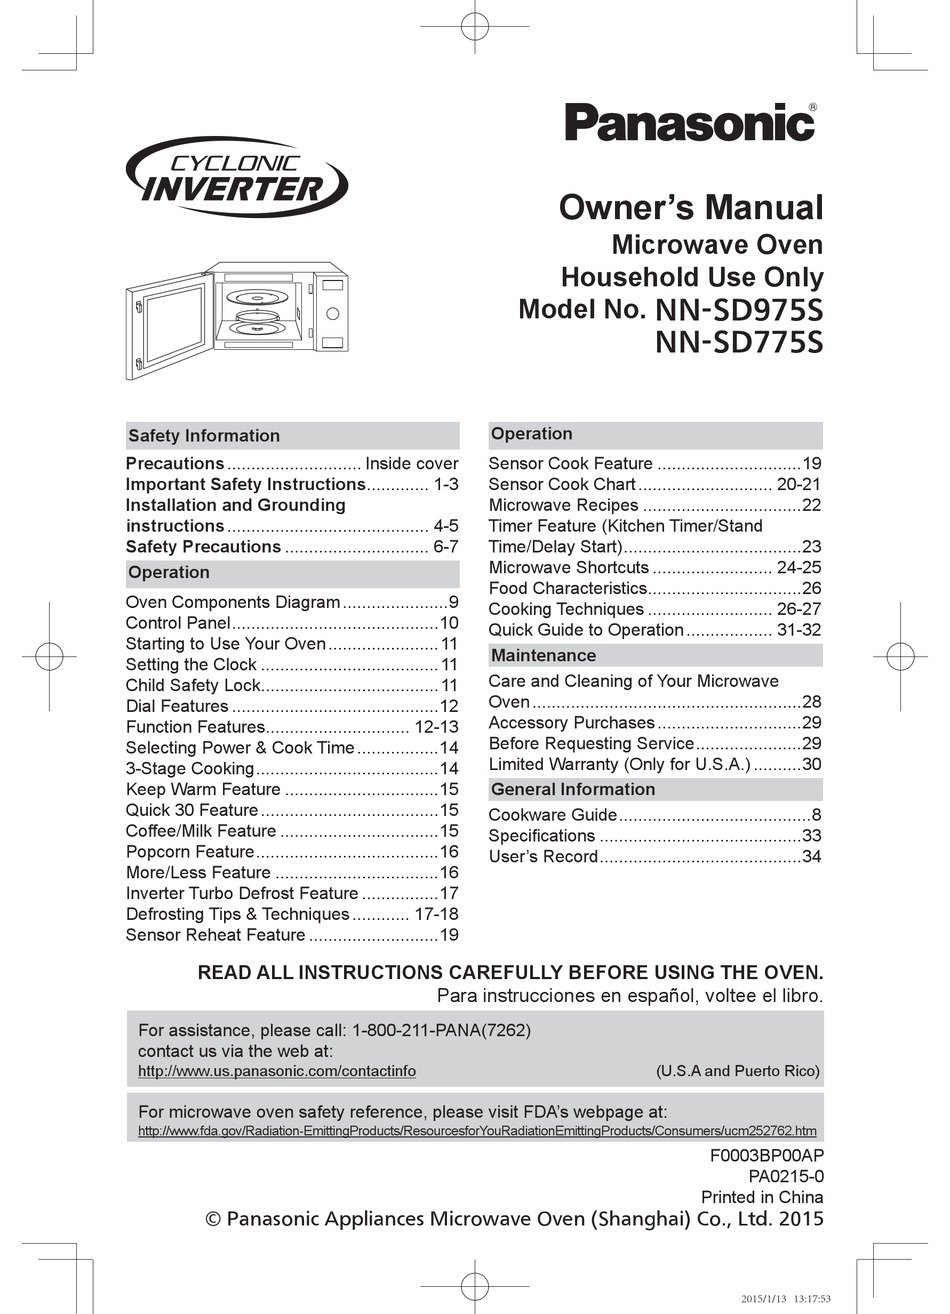 panasonic nn sd975s owner s manual pdf